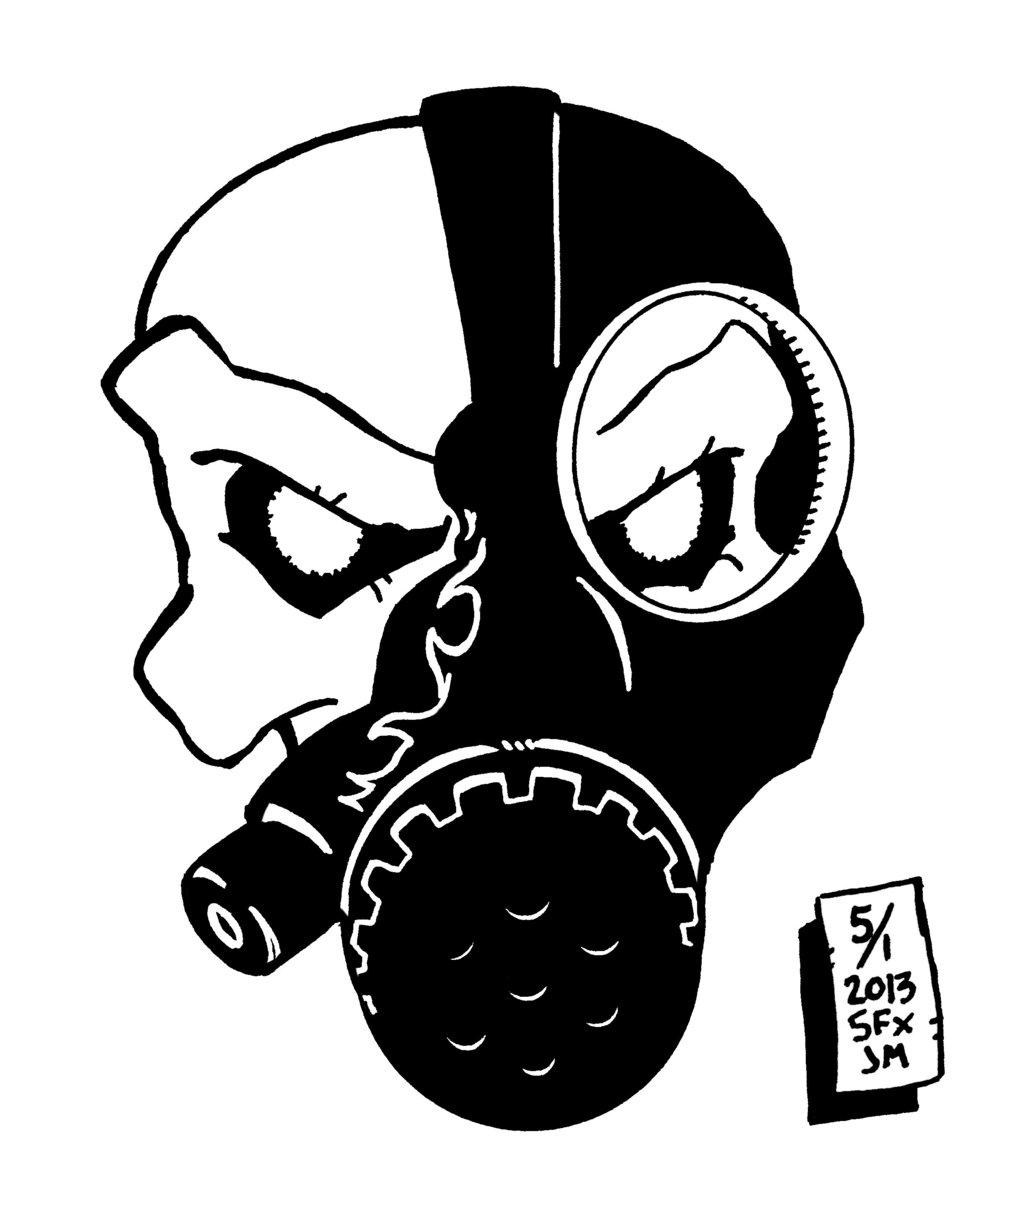 1024x1215 Graffiti Drawings Of Gas Mask Skull Elevation Skull By Chronosfx